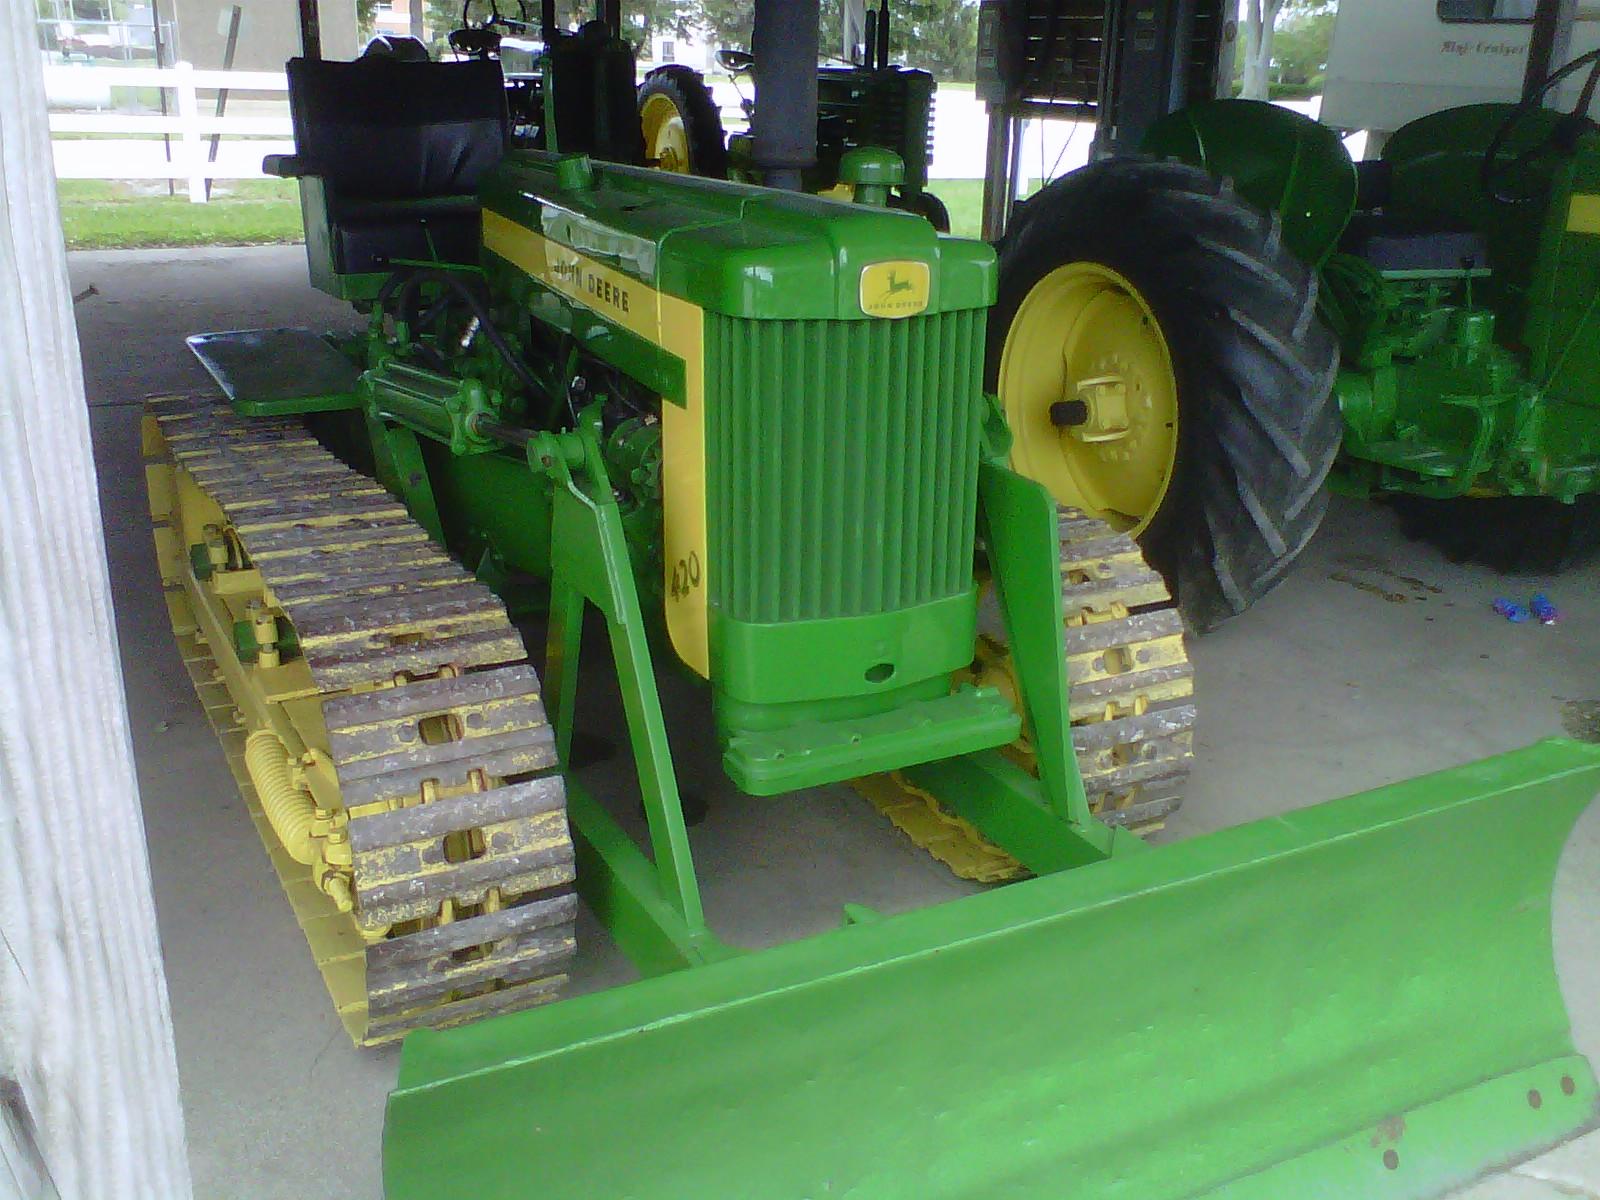 John Deere Wikipedia >> John Deere 420 Crawler Tractor Construction Plant Wiki